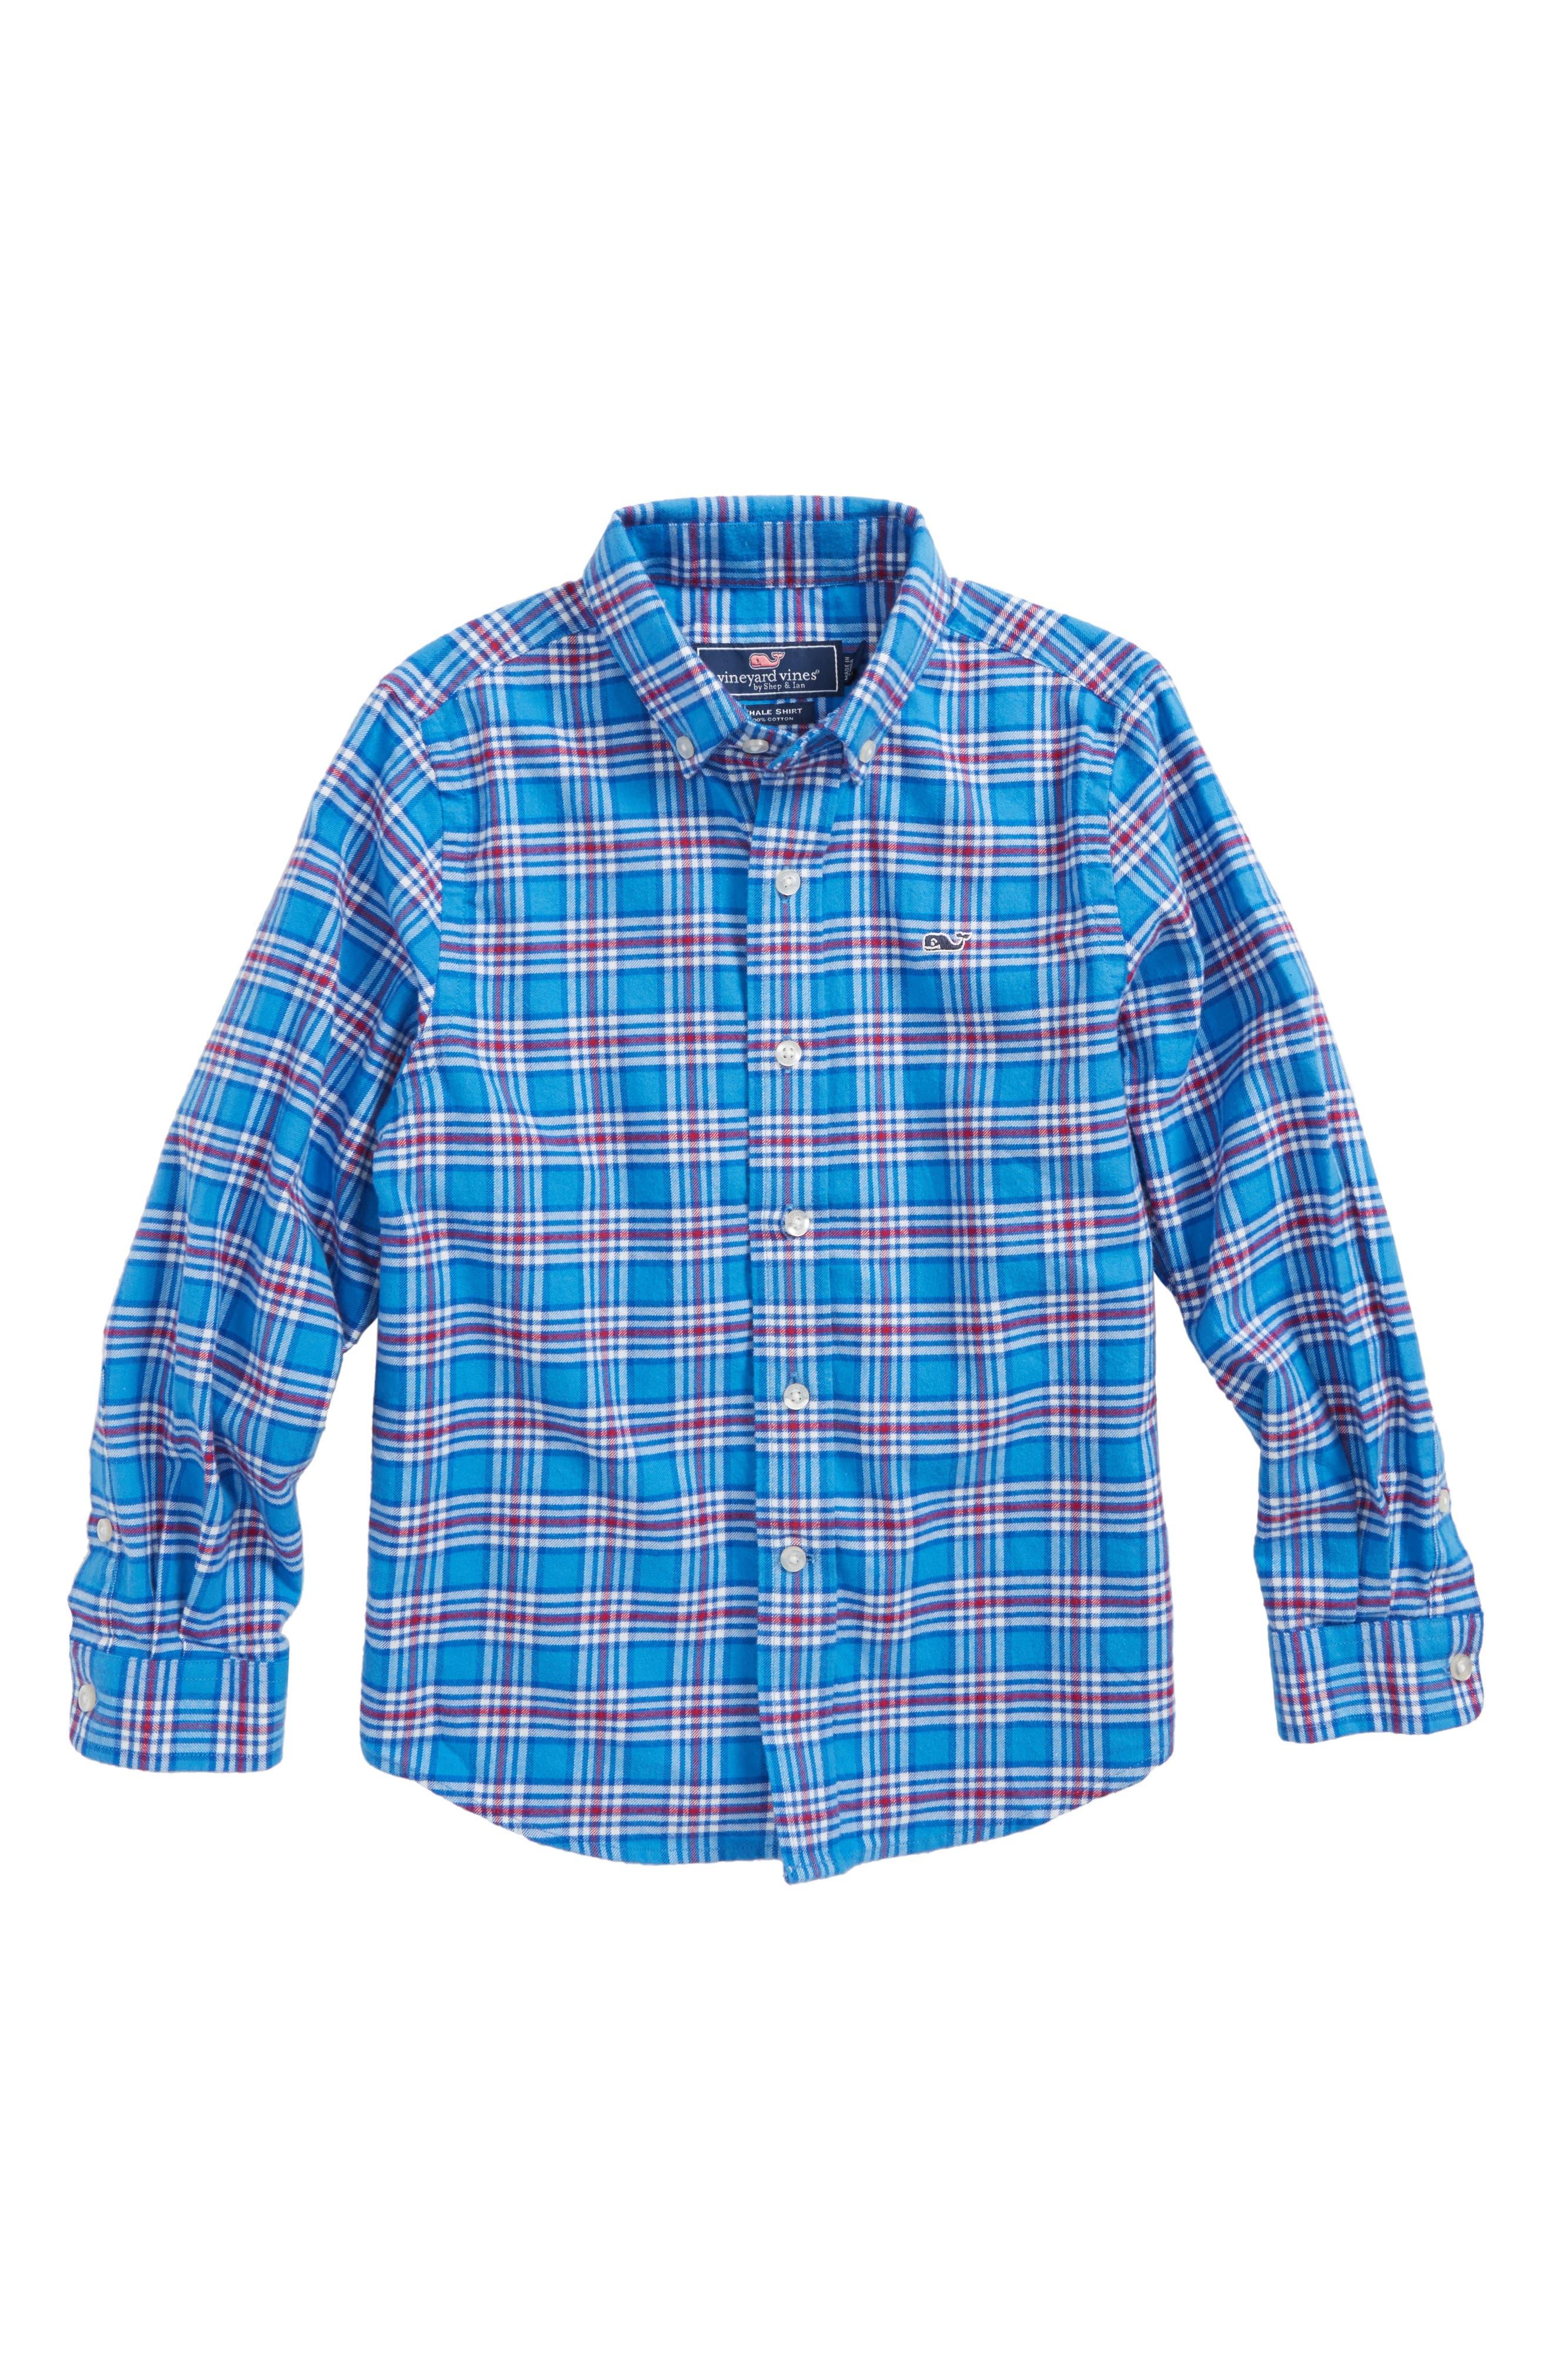 Chandler Pond Plaid Flannel Shirt,                             Main thumbnail 1, color,                             400